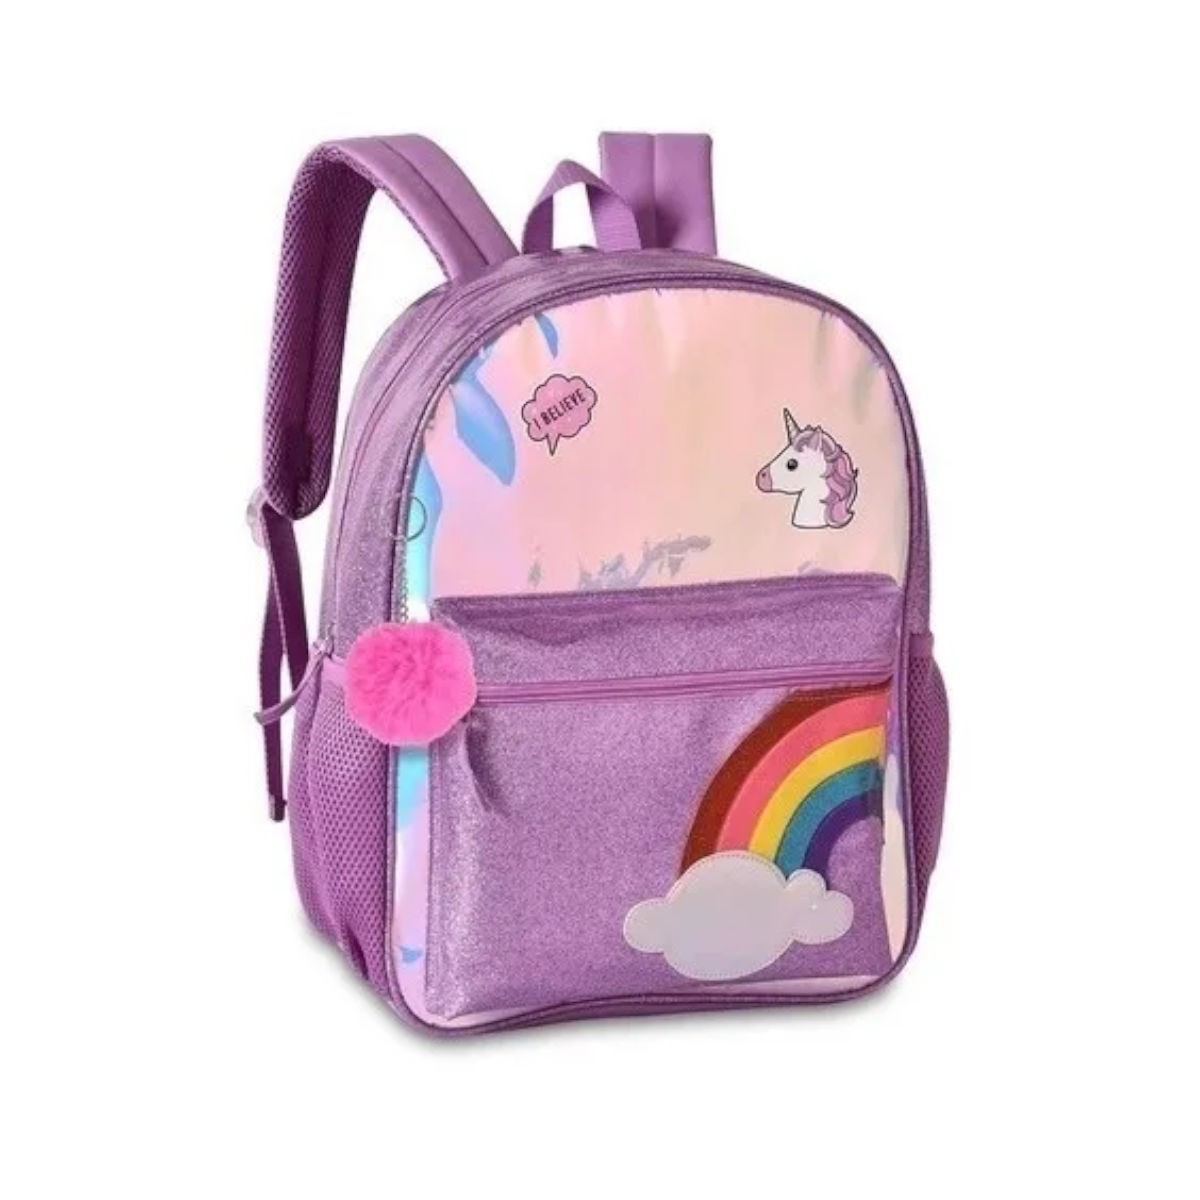 Mochila Infantil Costas Unicórnio Glitter Holográfica Clio